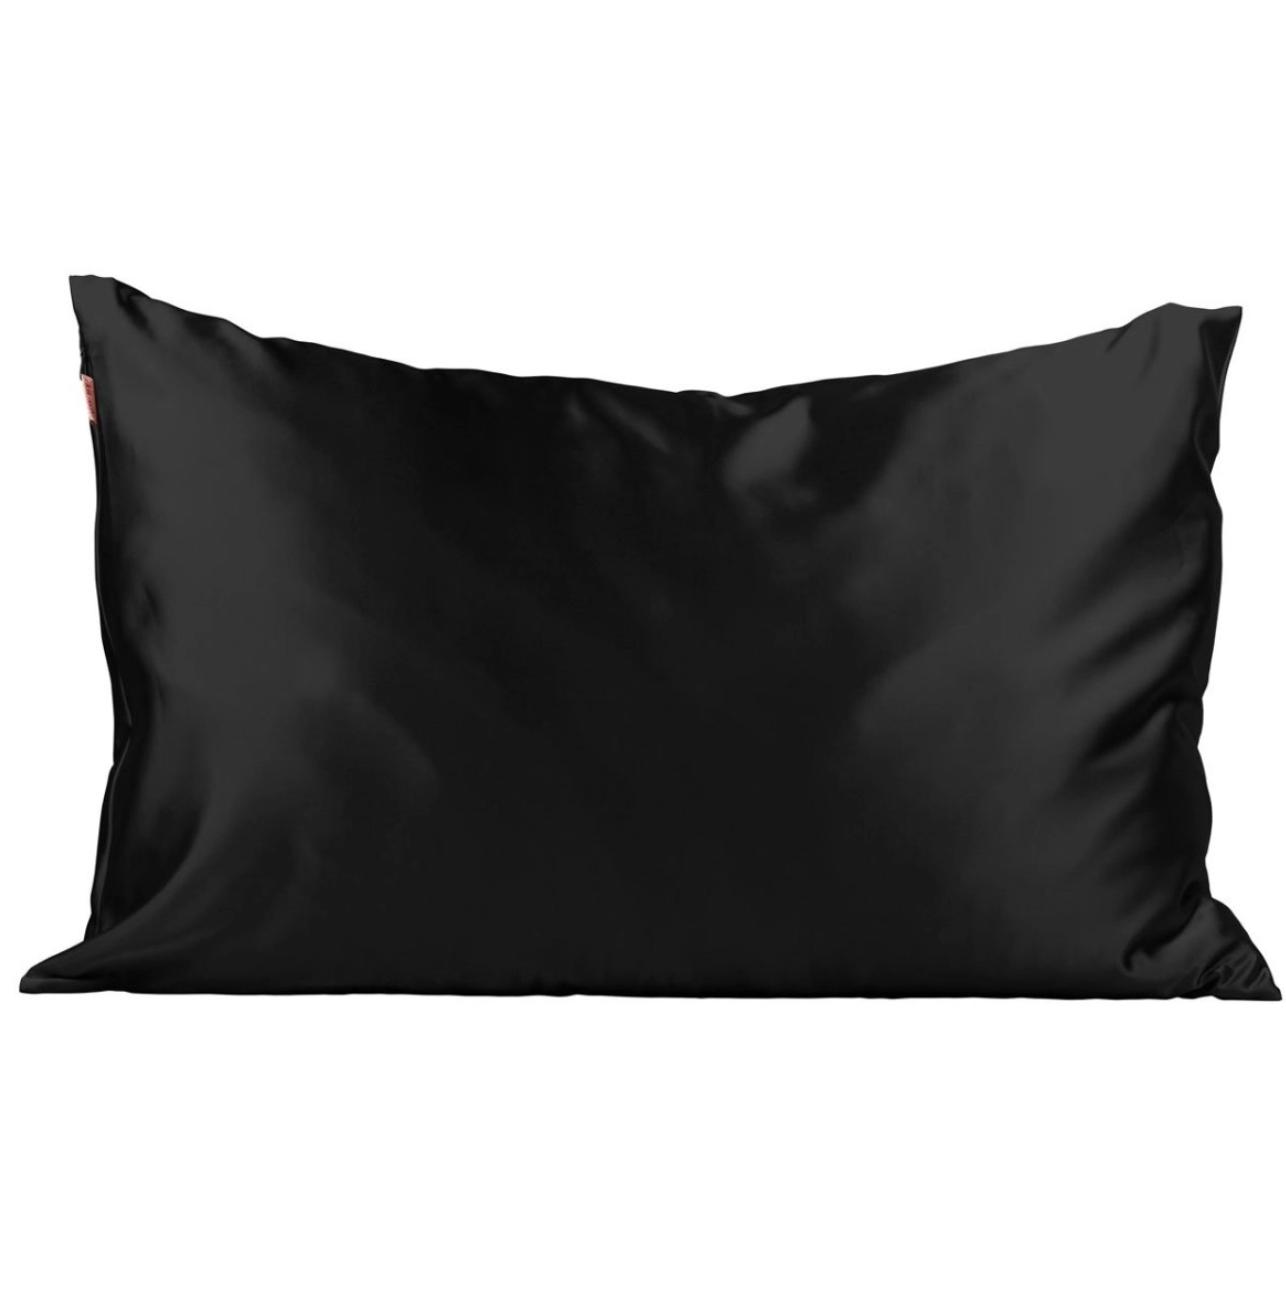 Kitsch Satin Pillowcase - Black